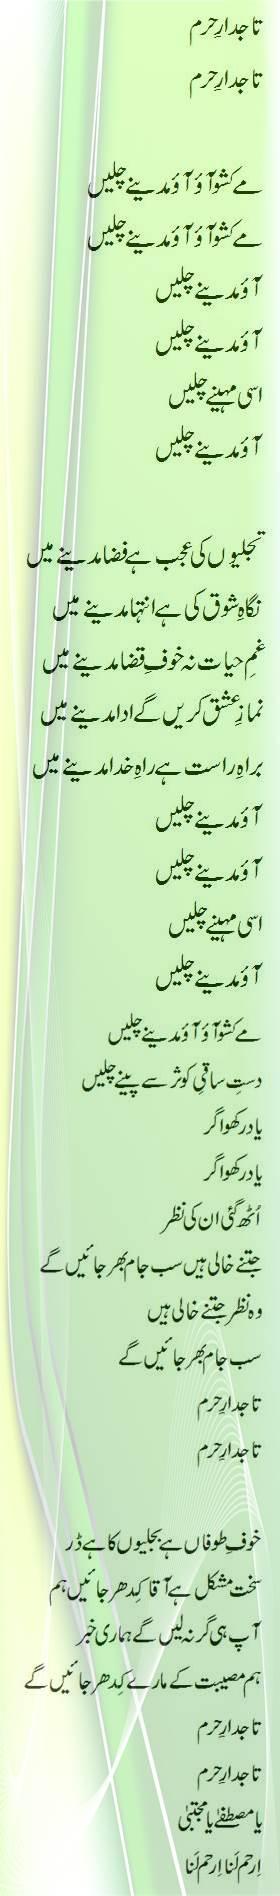 Tjadar e Haram lyrics in Urdu 2